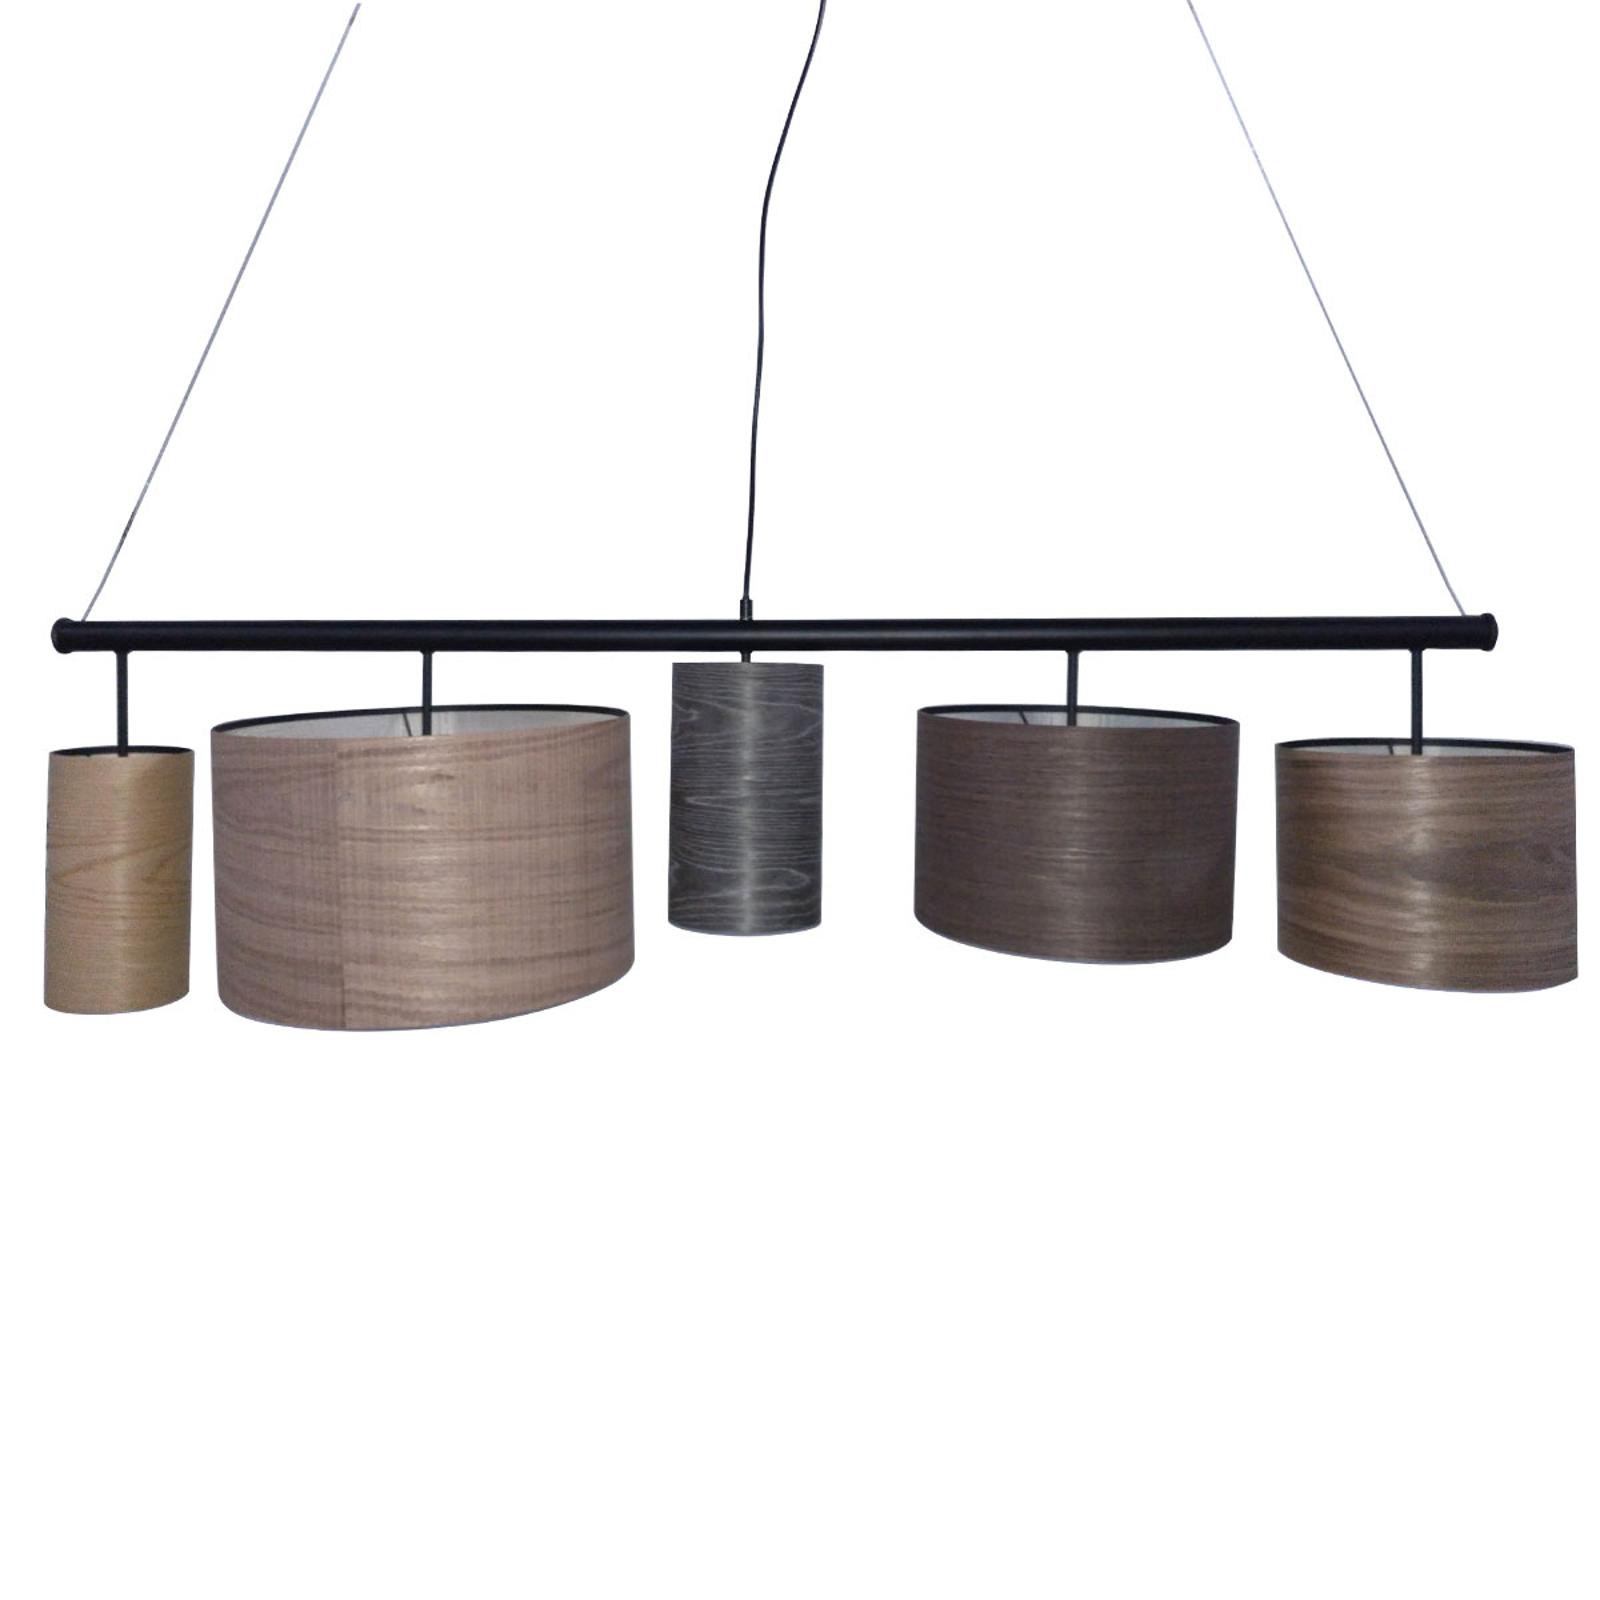 KARE Parecchi Wood Colore hanglamp